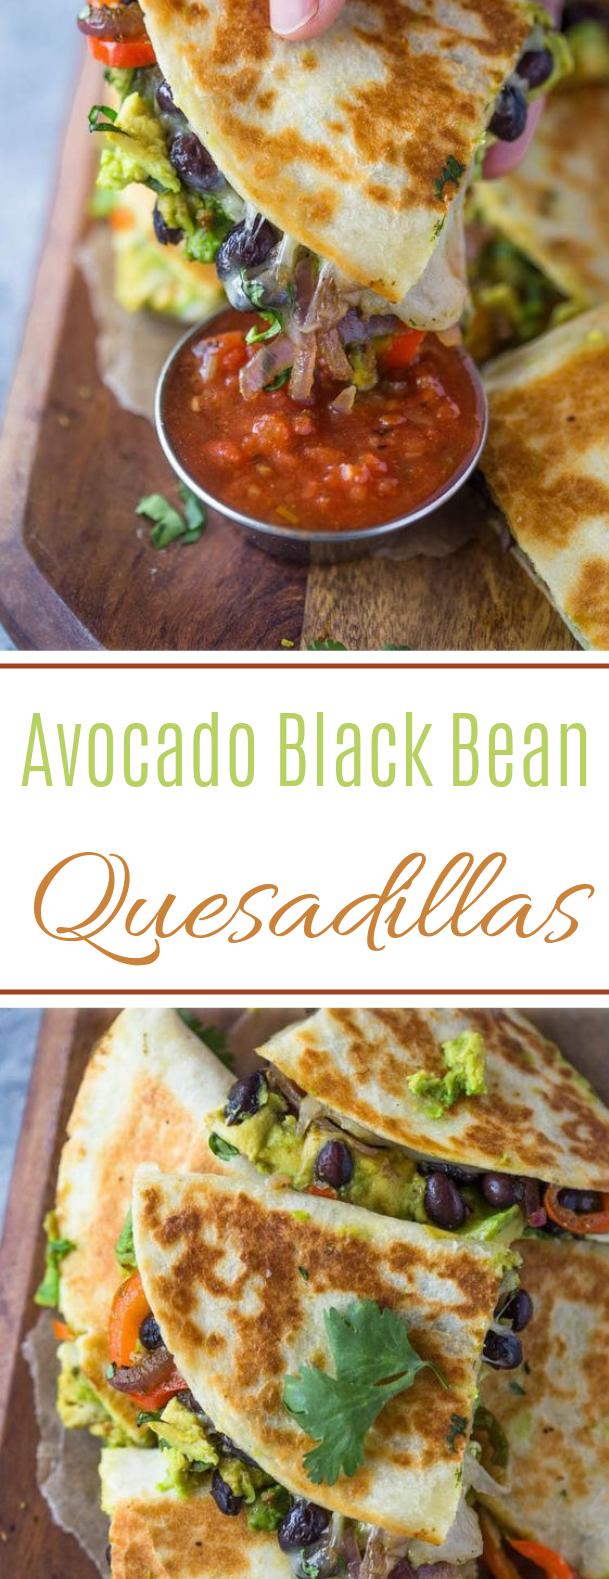 Avocado Black Bean Quesadillas #lunch #vegetarian